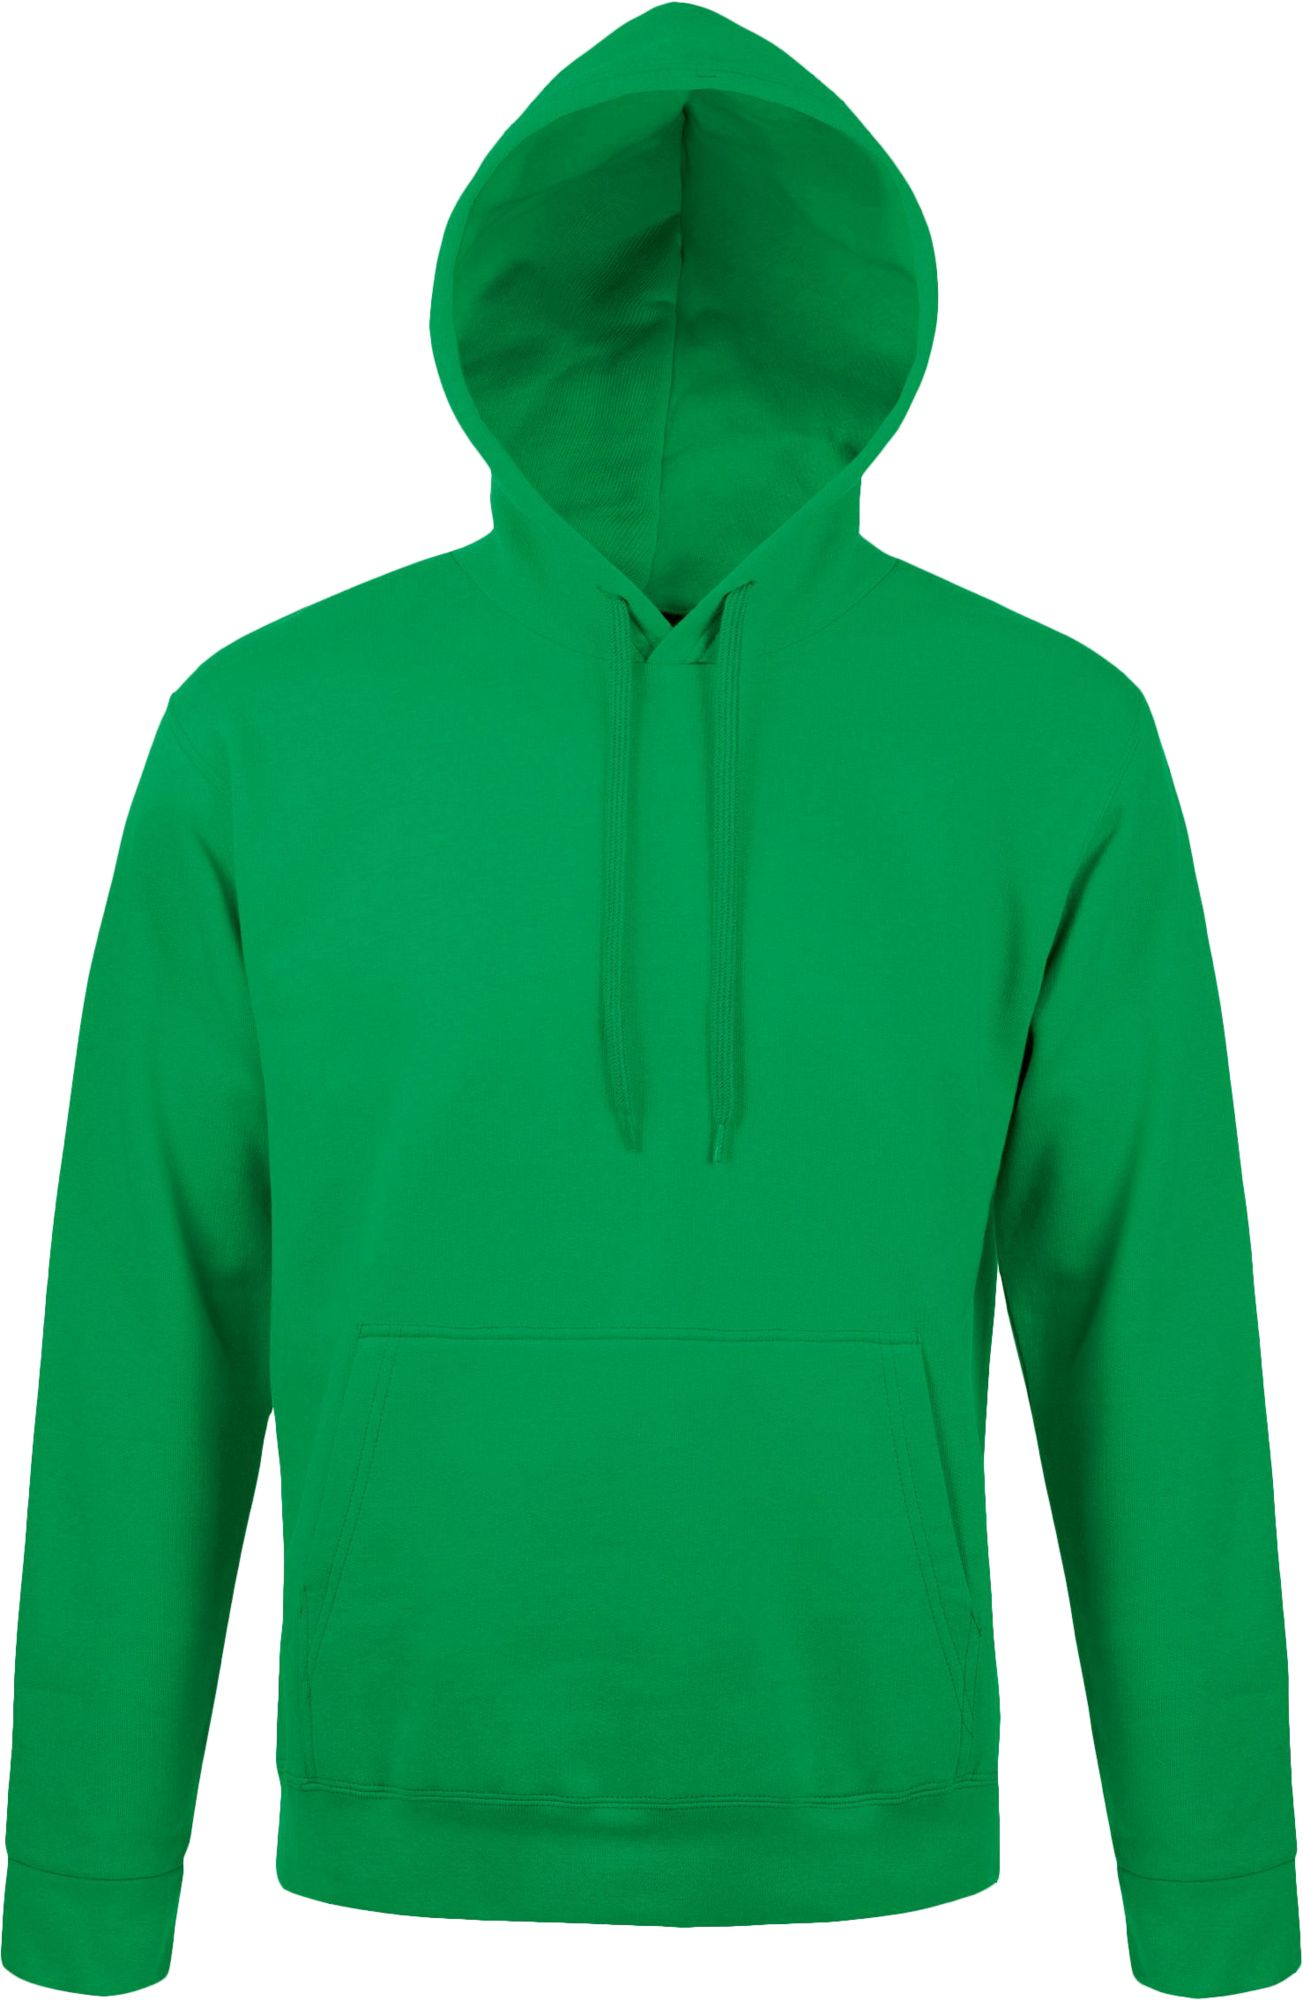 Толстовка с капюшоном Snake 280, ярко-зеленая